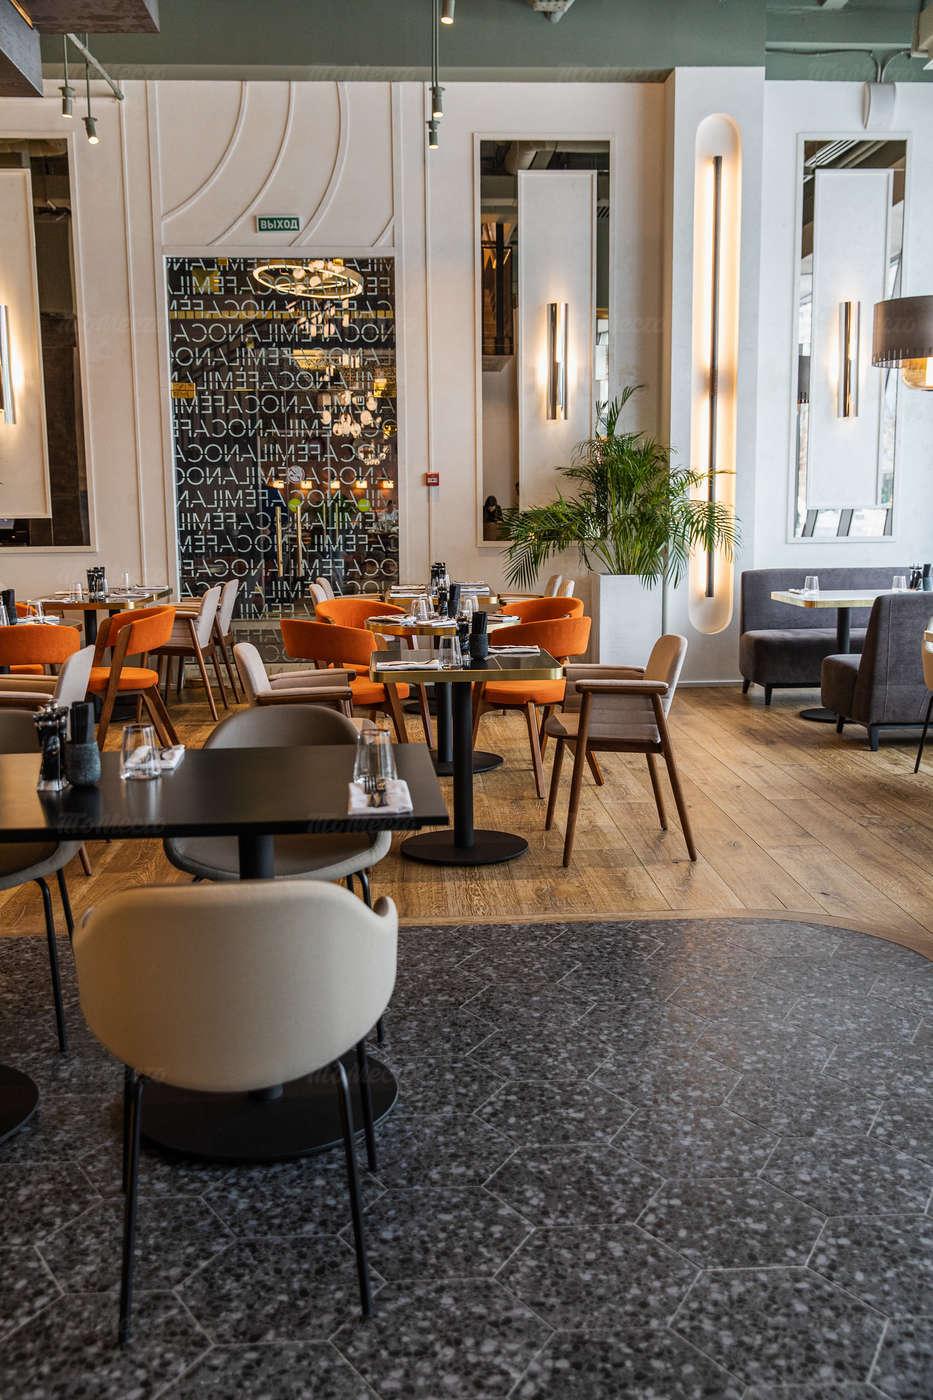 Ресторан Cafe Milano (Милано) на Новом Арбате фото 3